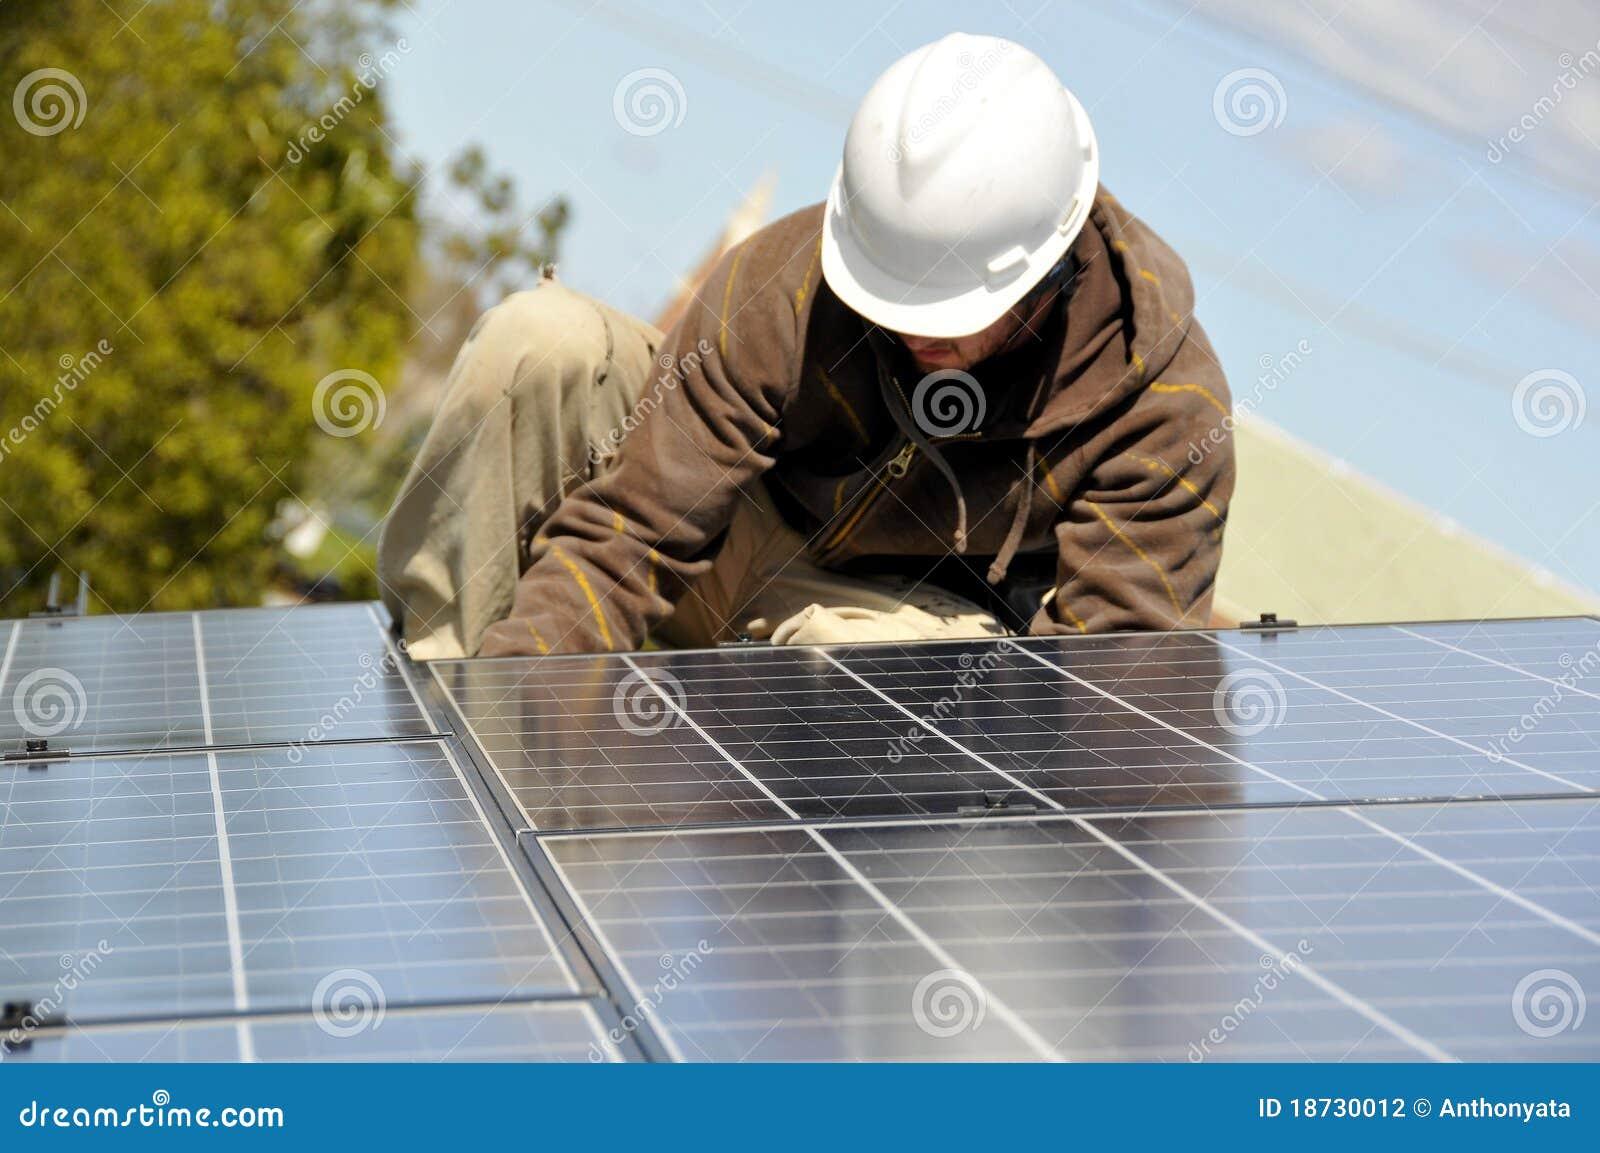 Instalando o painel solar que prende 3